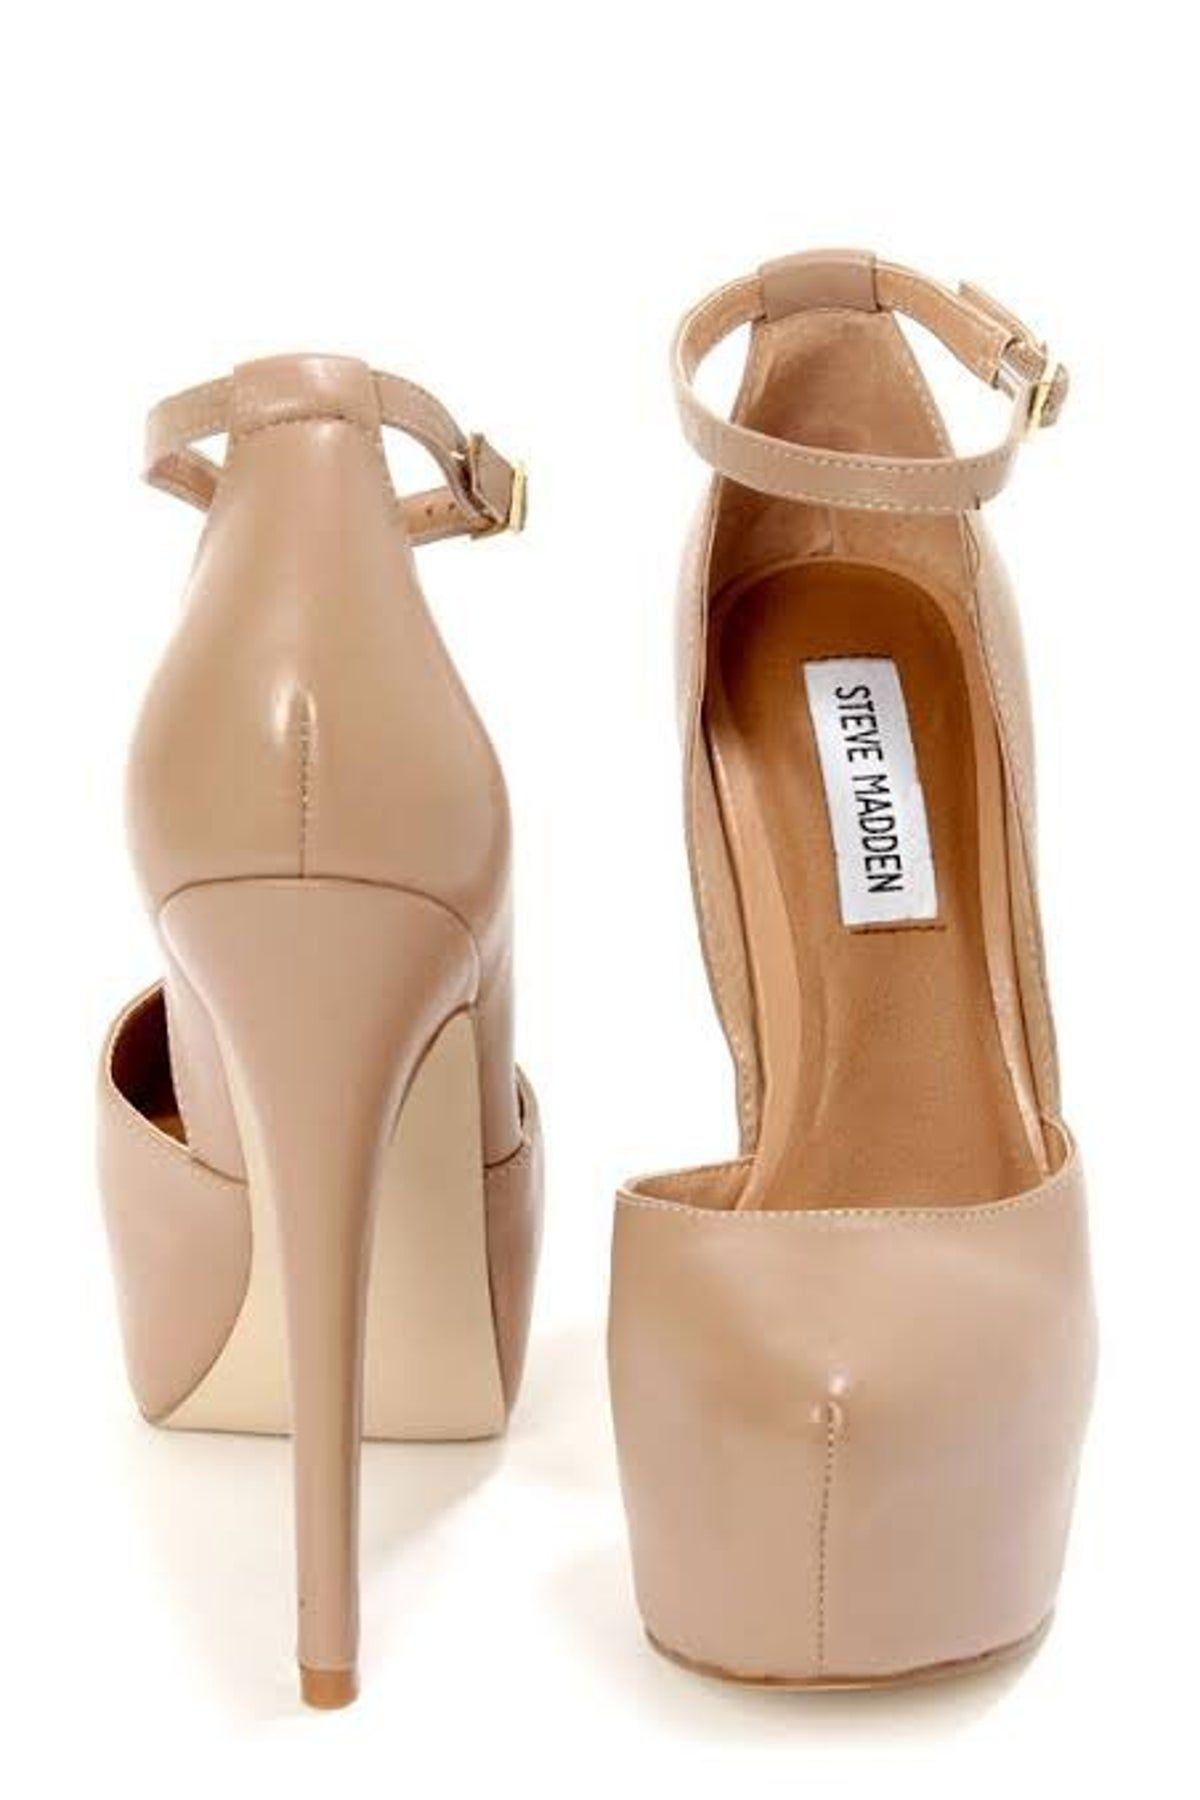 Pin on Steve madden shoe heels